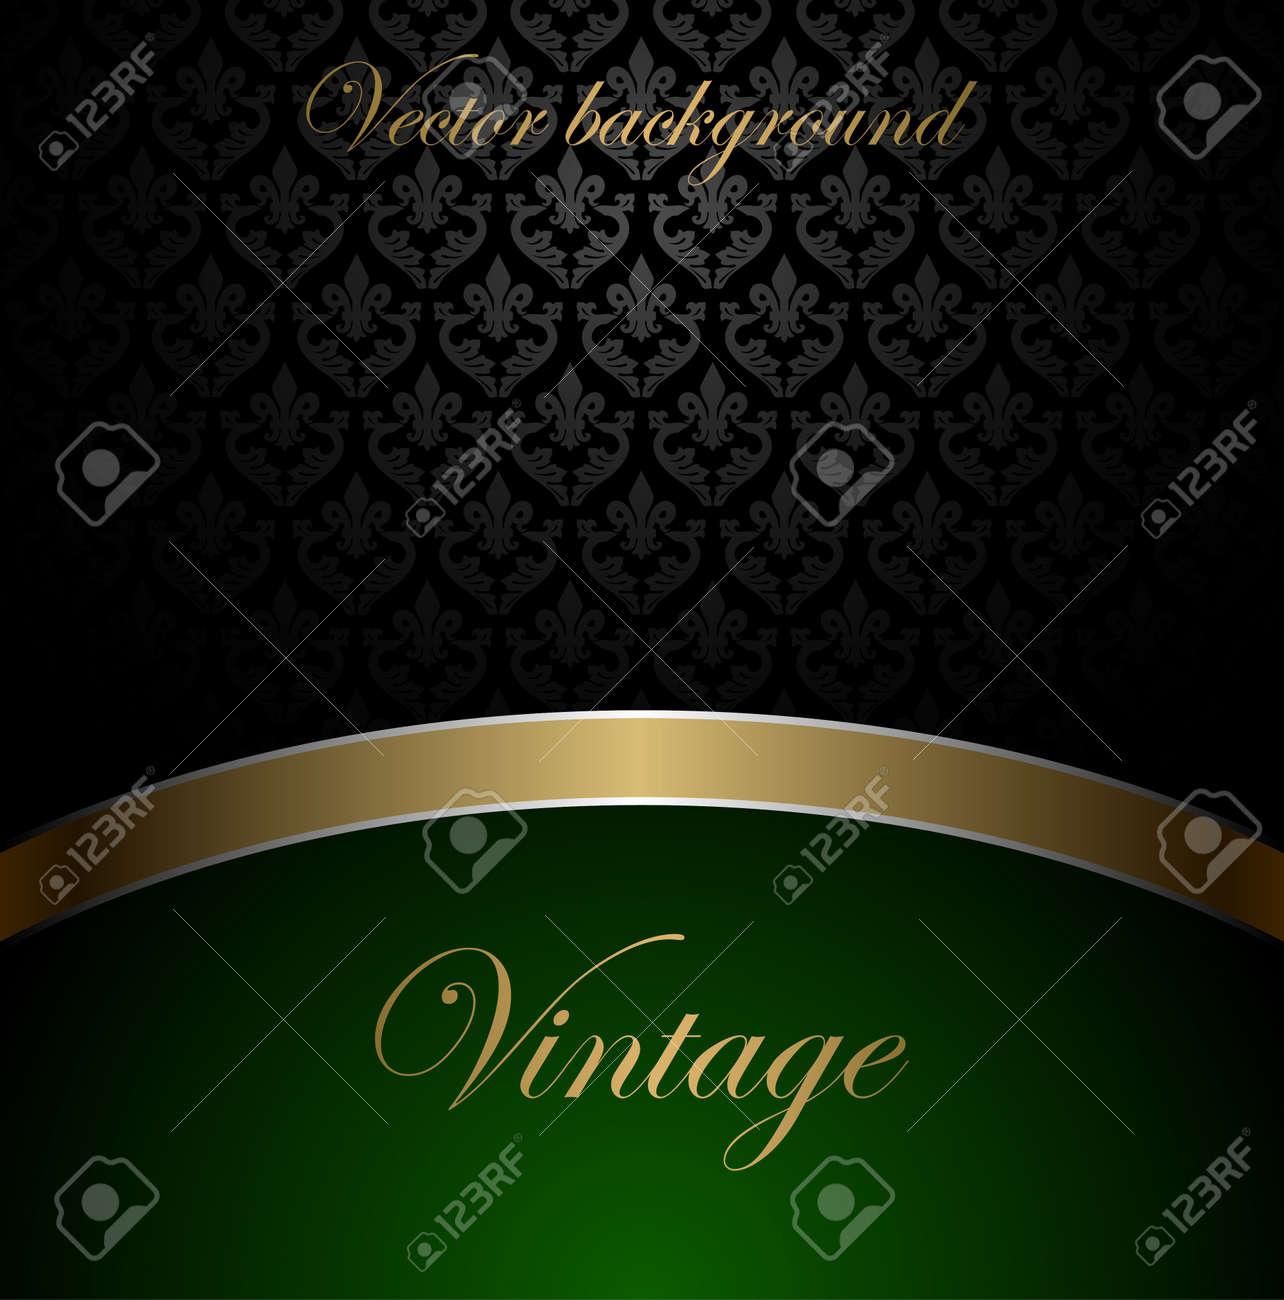 Vintage vector background Stock Vector - 11030597